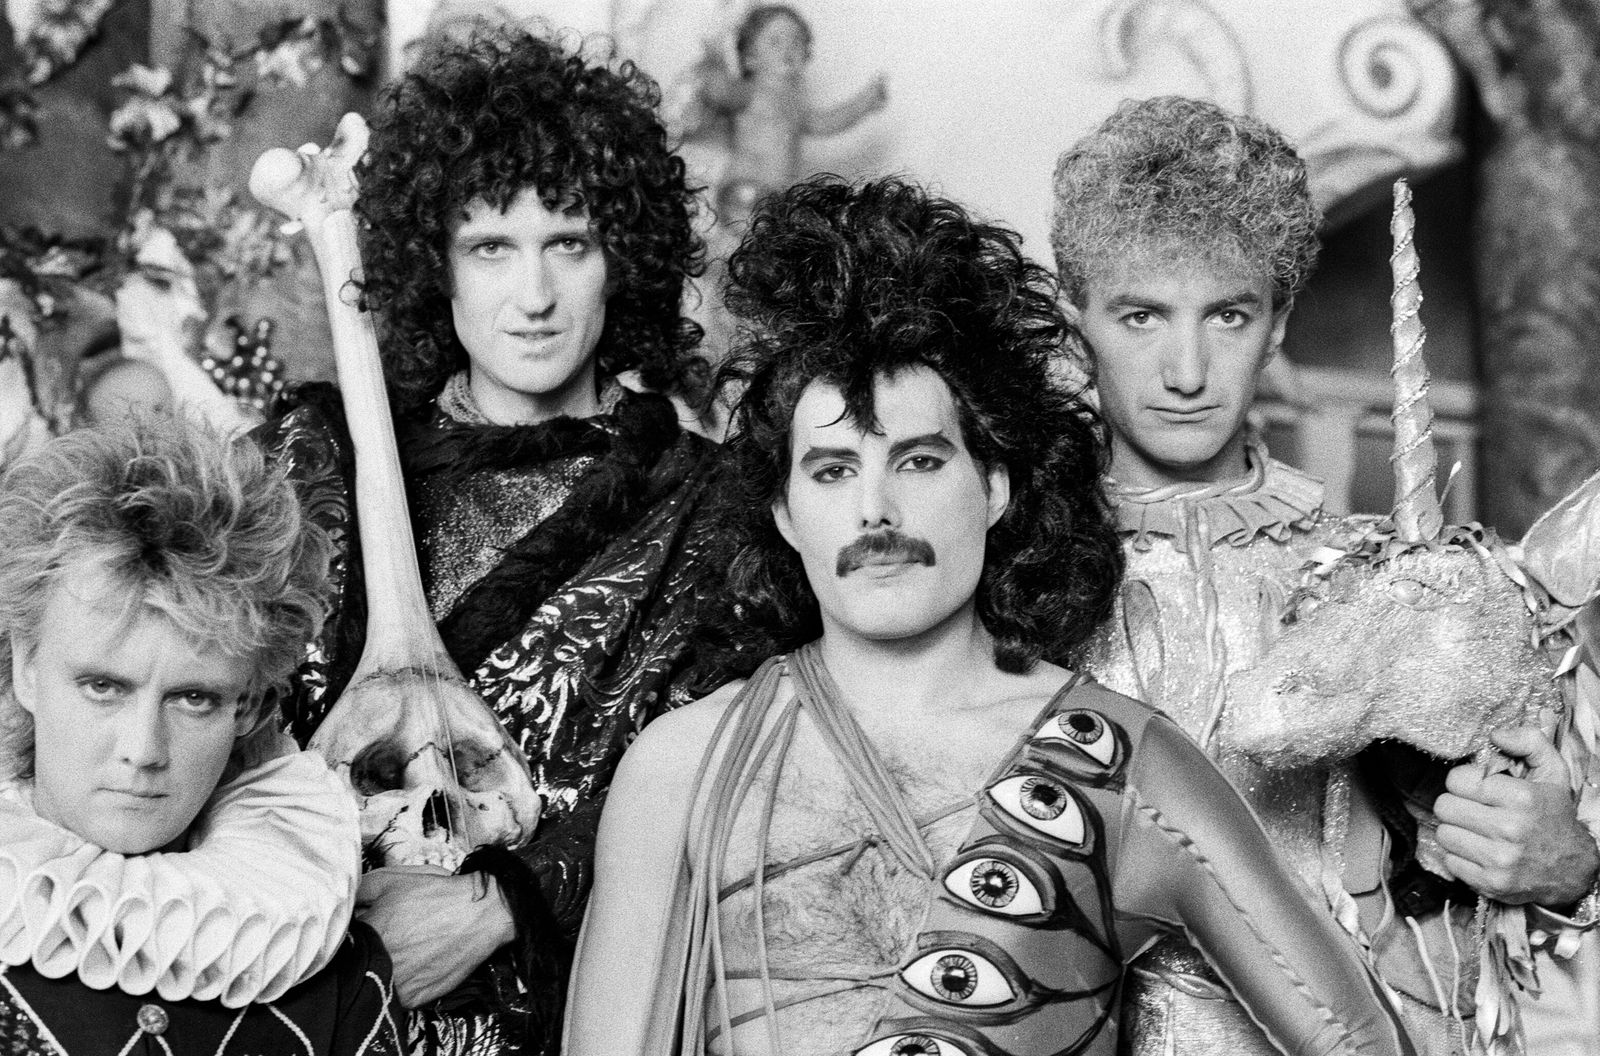 Queen making music video 1984